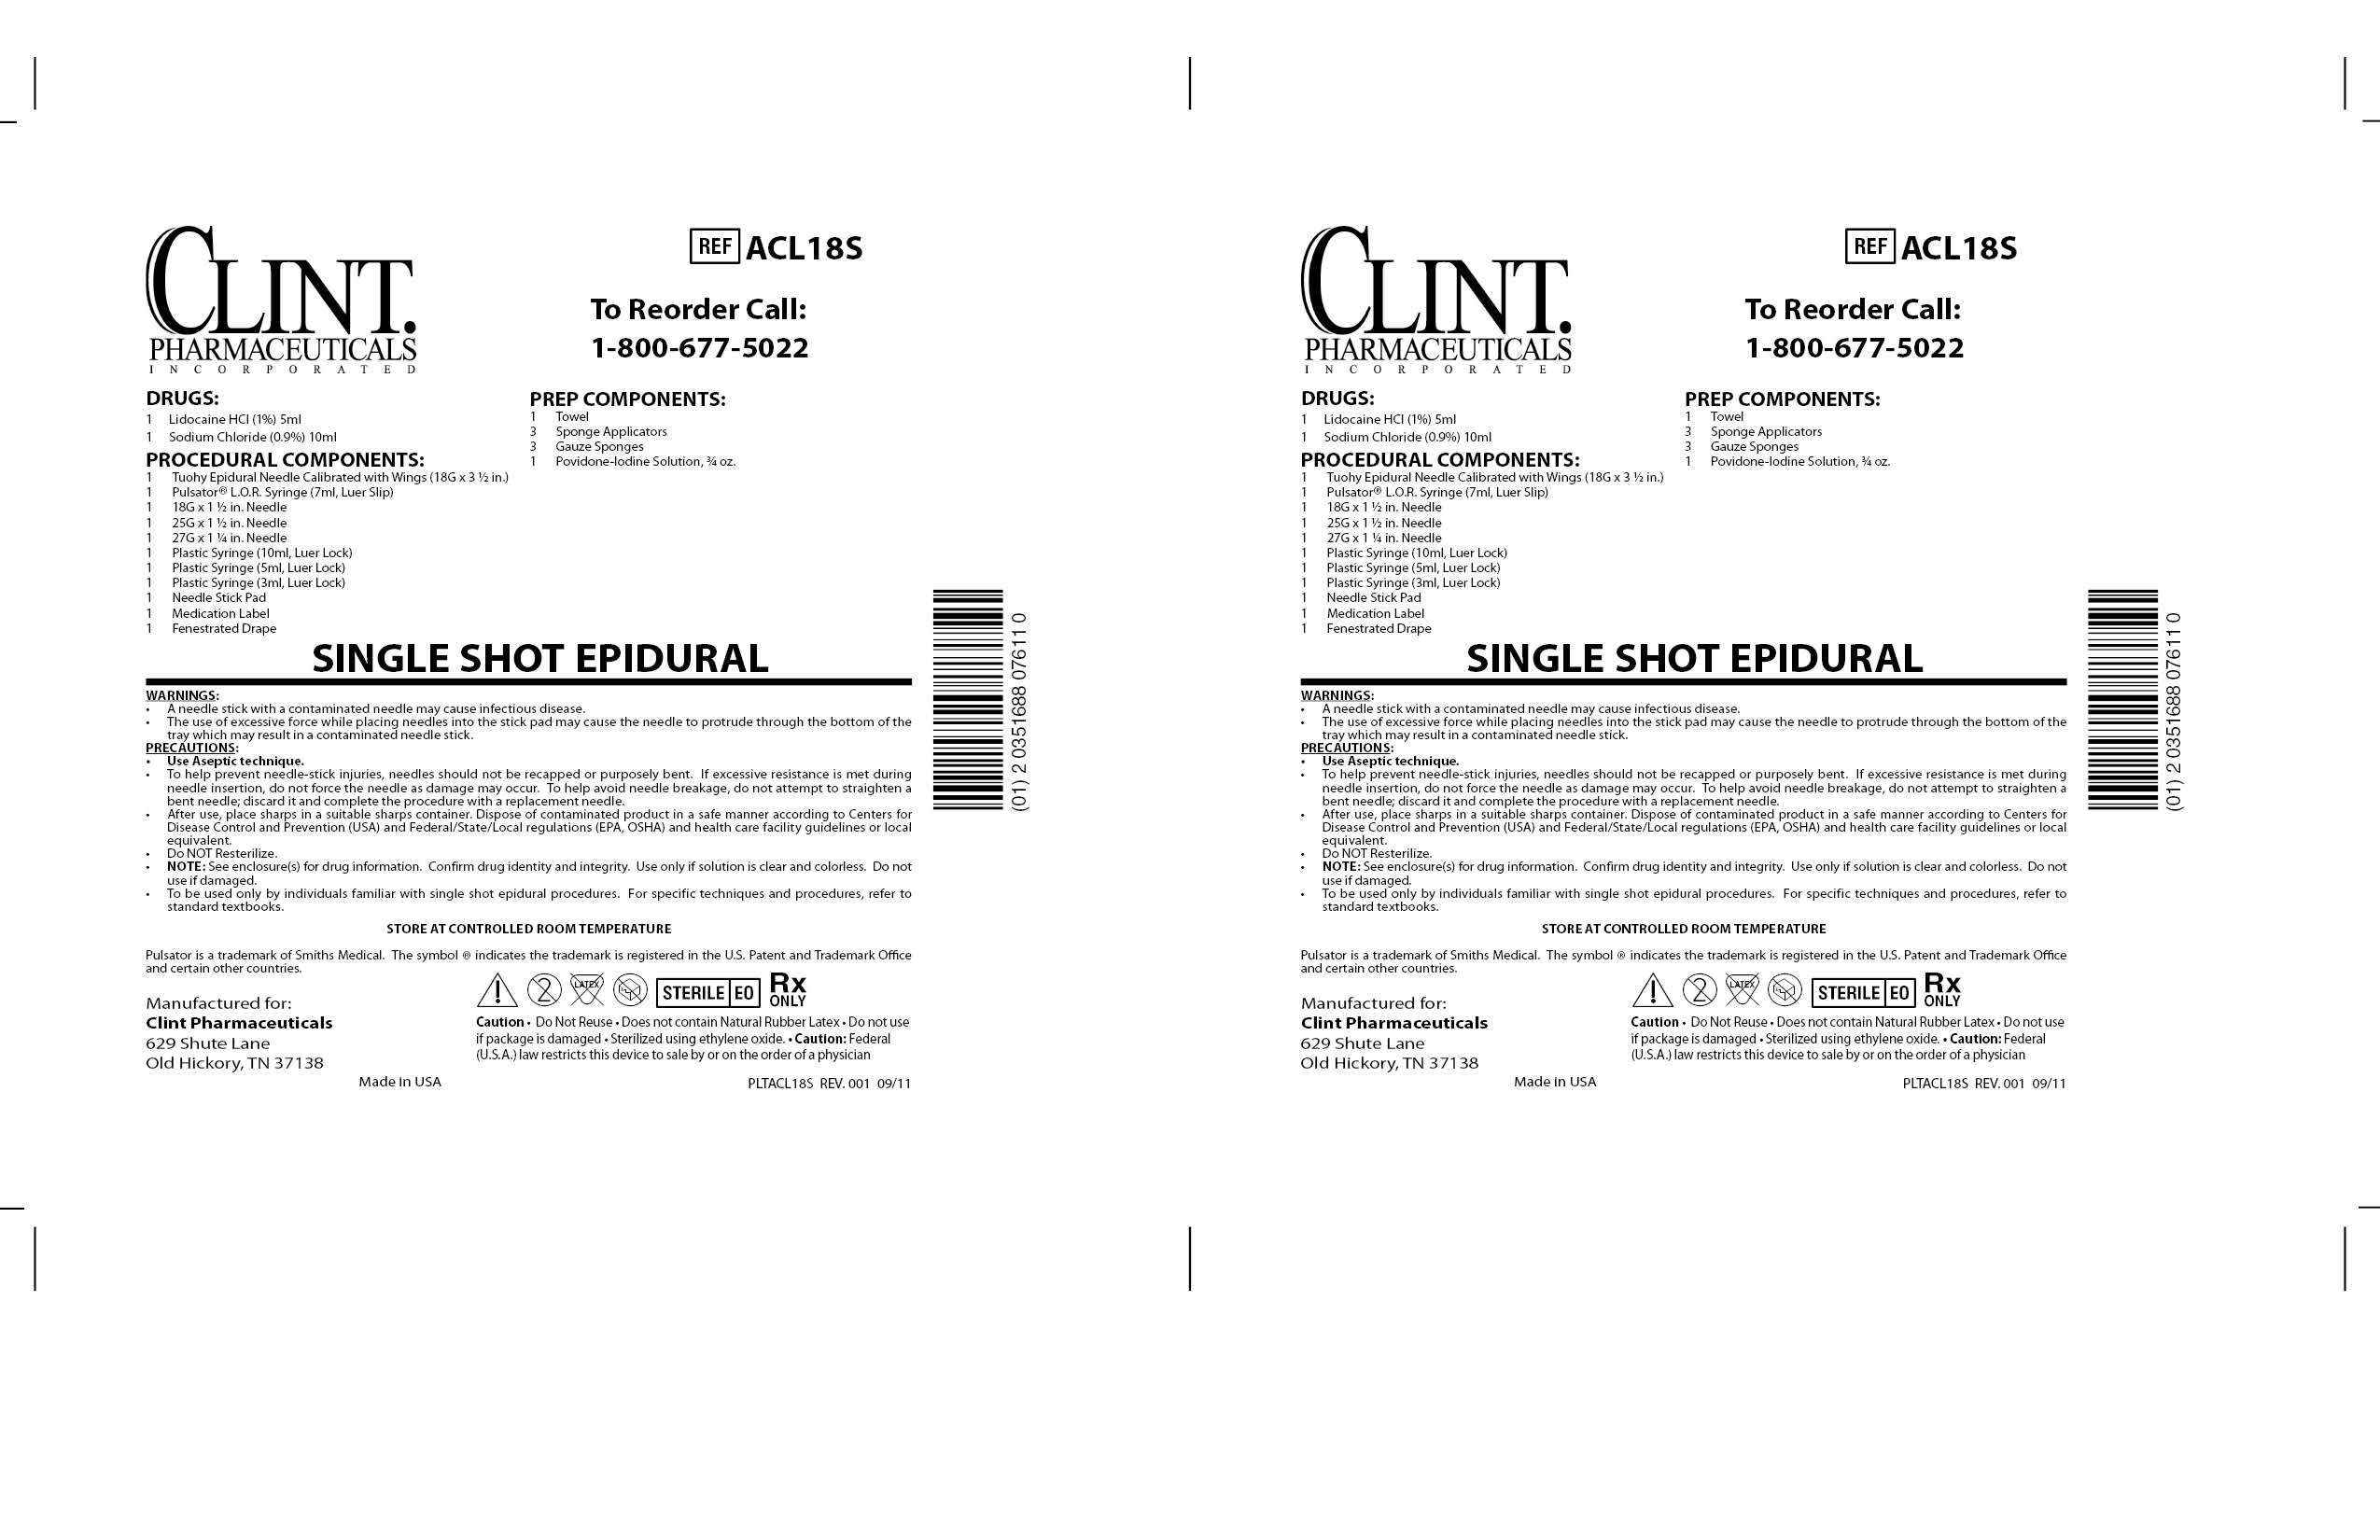 Acl18s Single Shot Epidural () Kit [Clint Pharmaceuticals, Inc.]